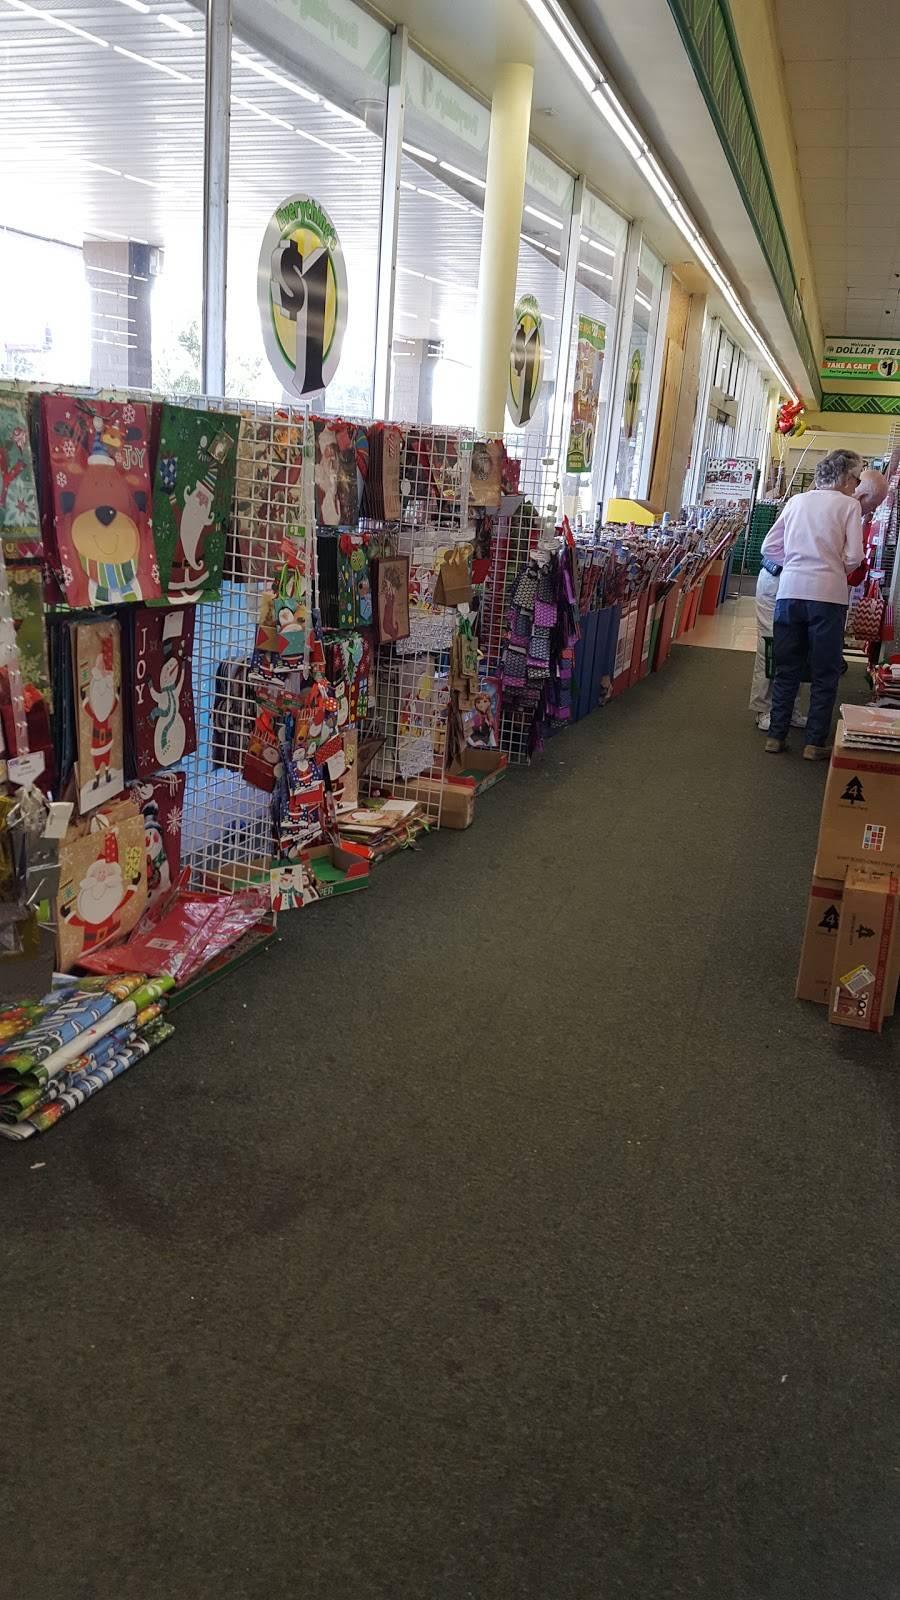 Dollar Tree - furniture store  | Photo 9 of 10 | Address: 3636 Blanding Blvd Ste 17, Jacksonville, FL 32210, USA | Phone: (904) 701-6667